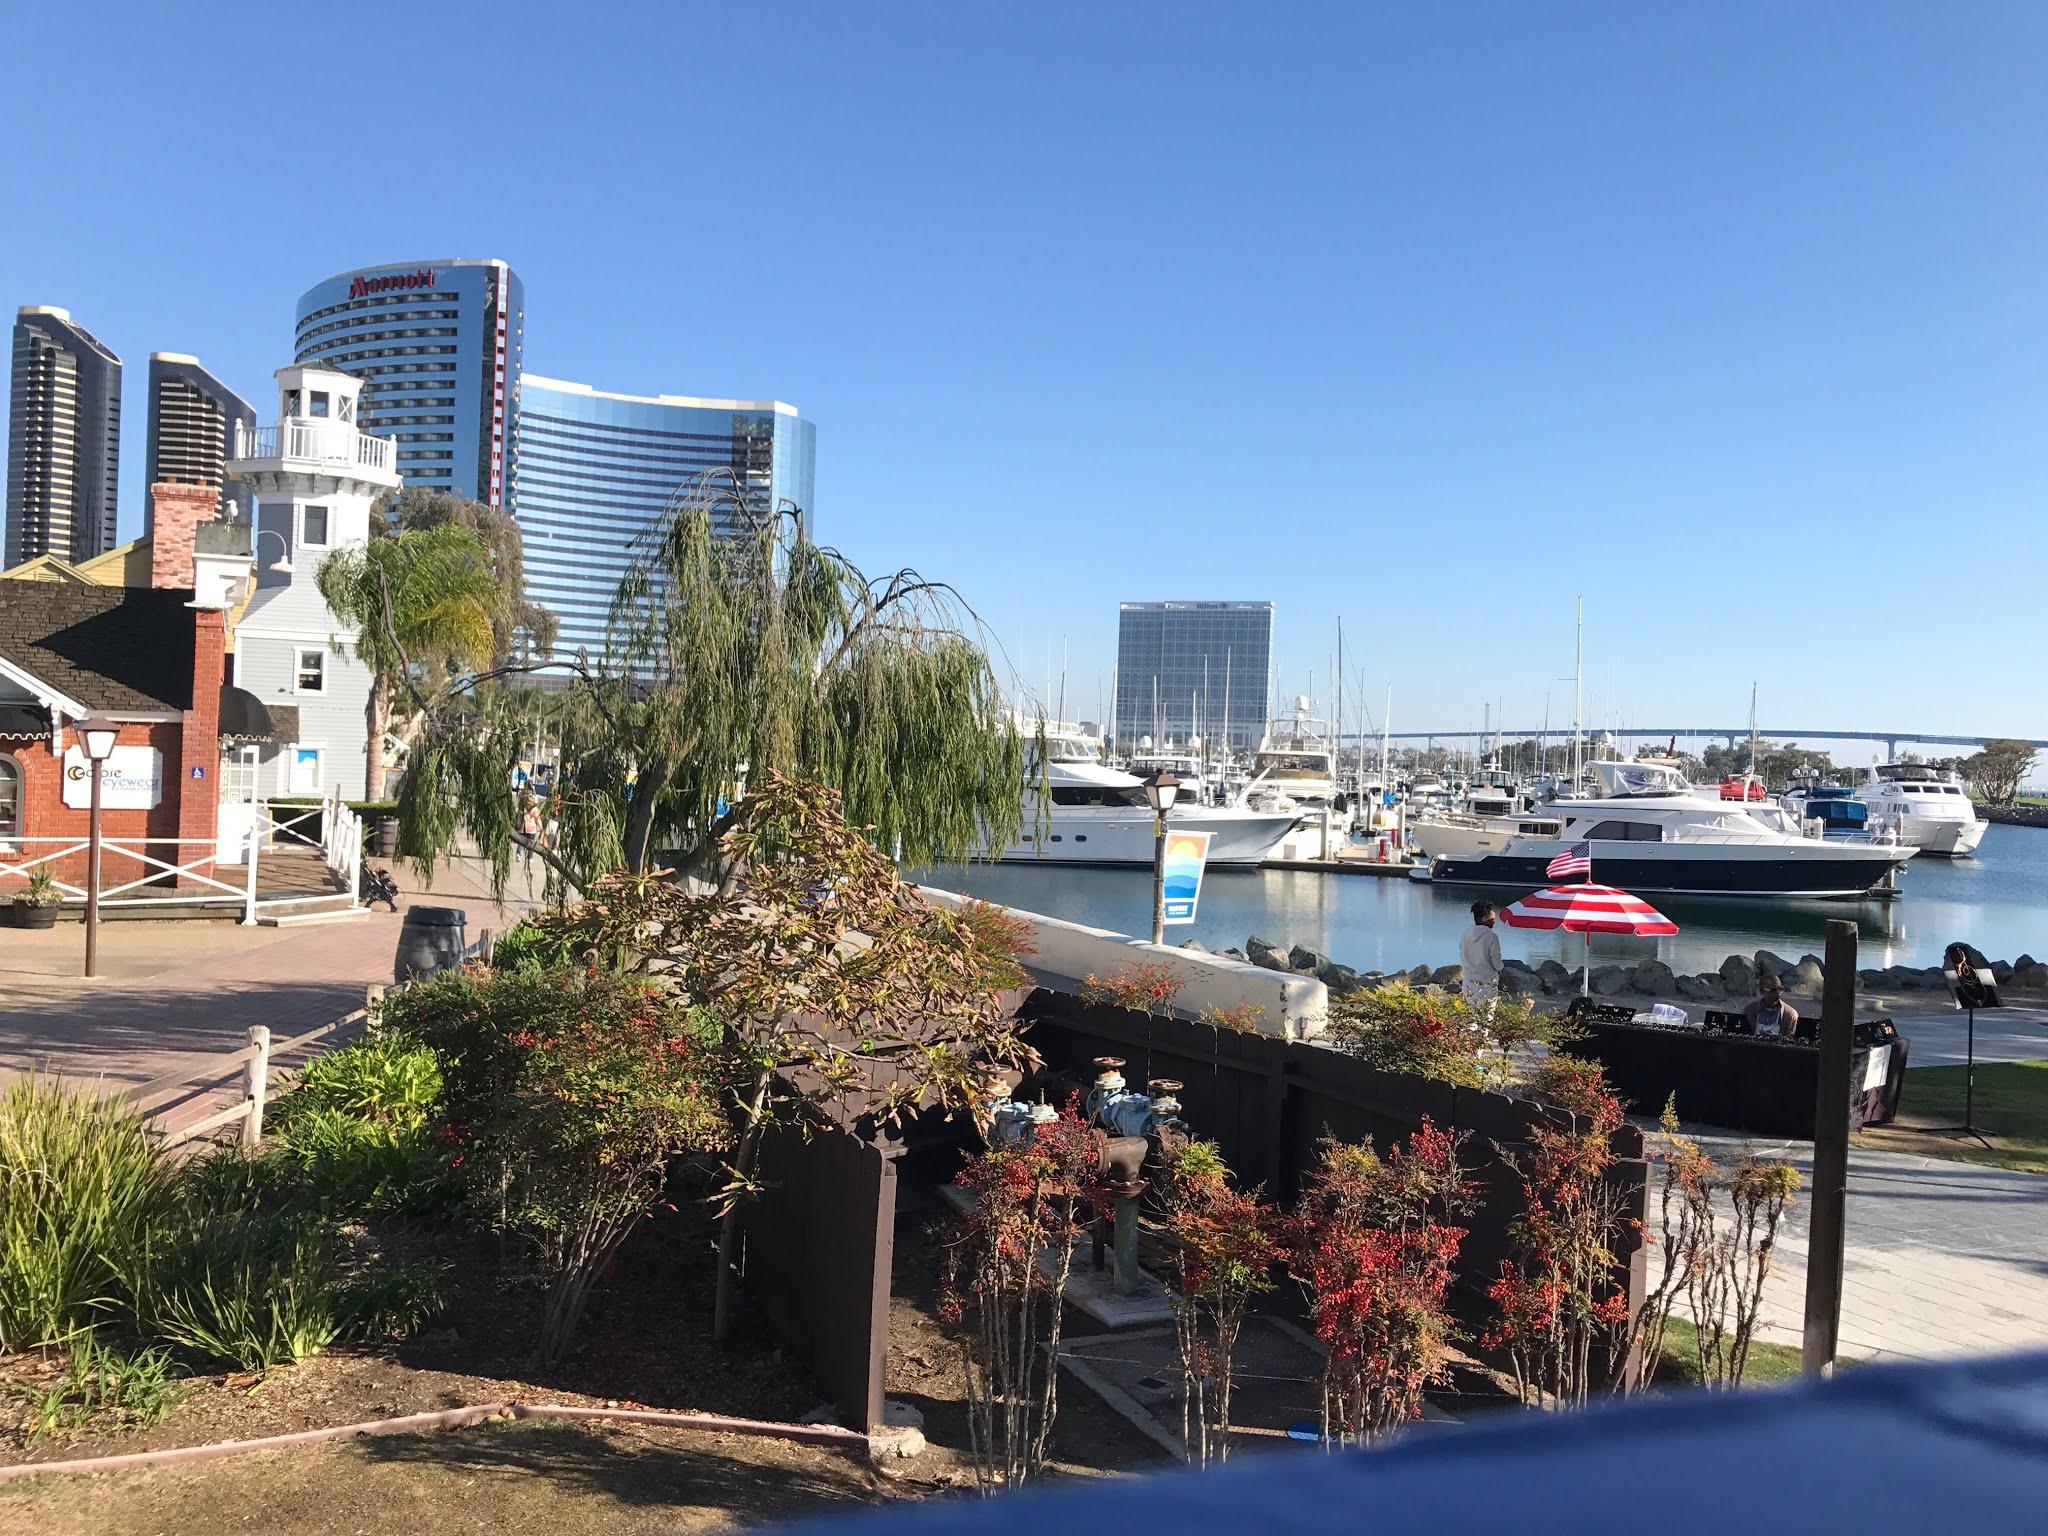 Seaport Village shopping a céu aberto porto de San Diego